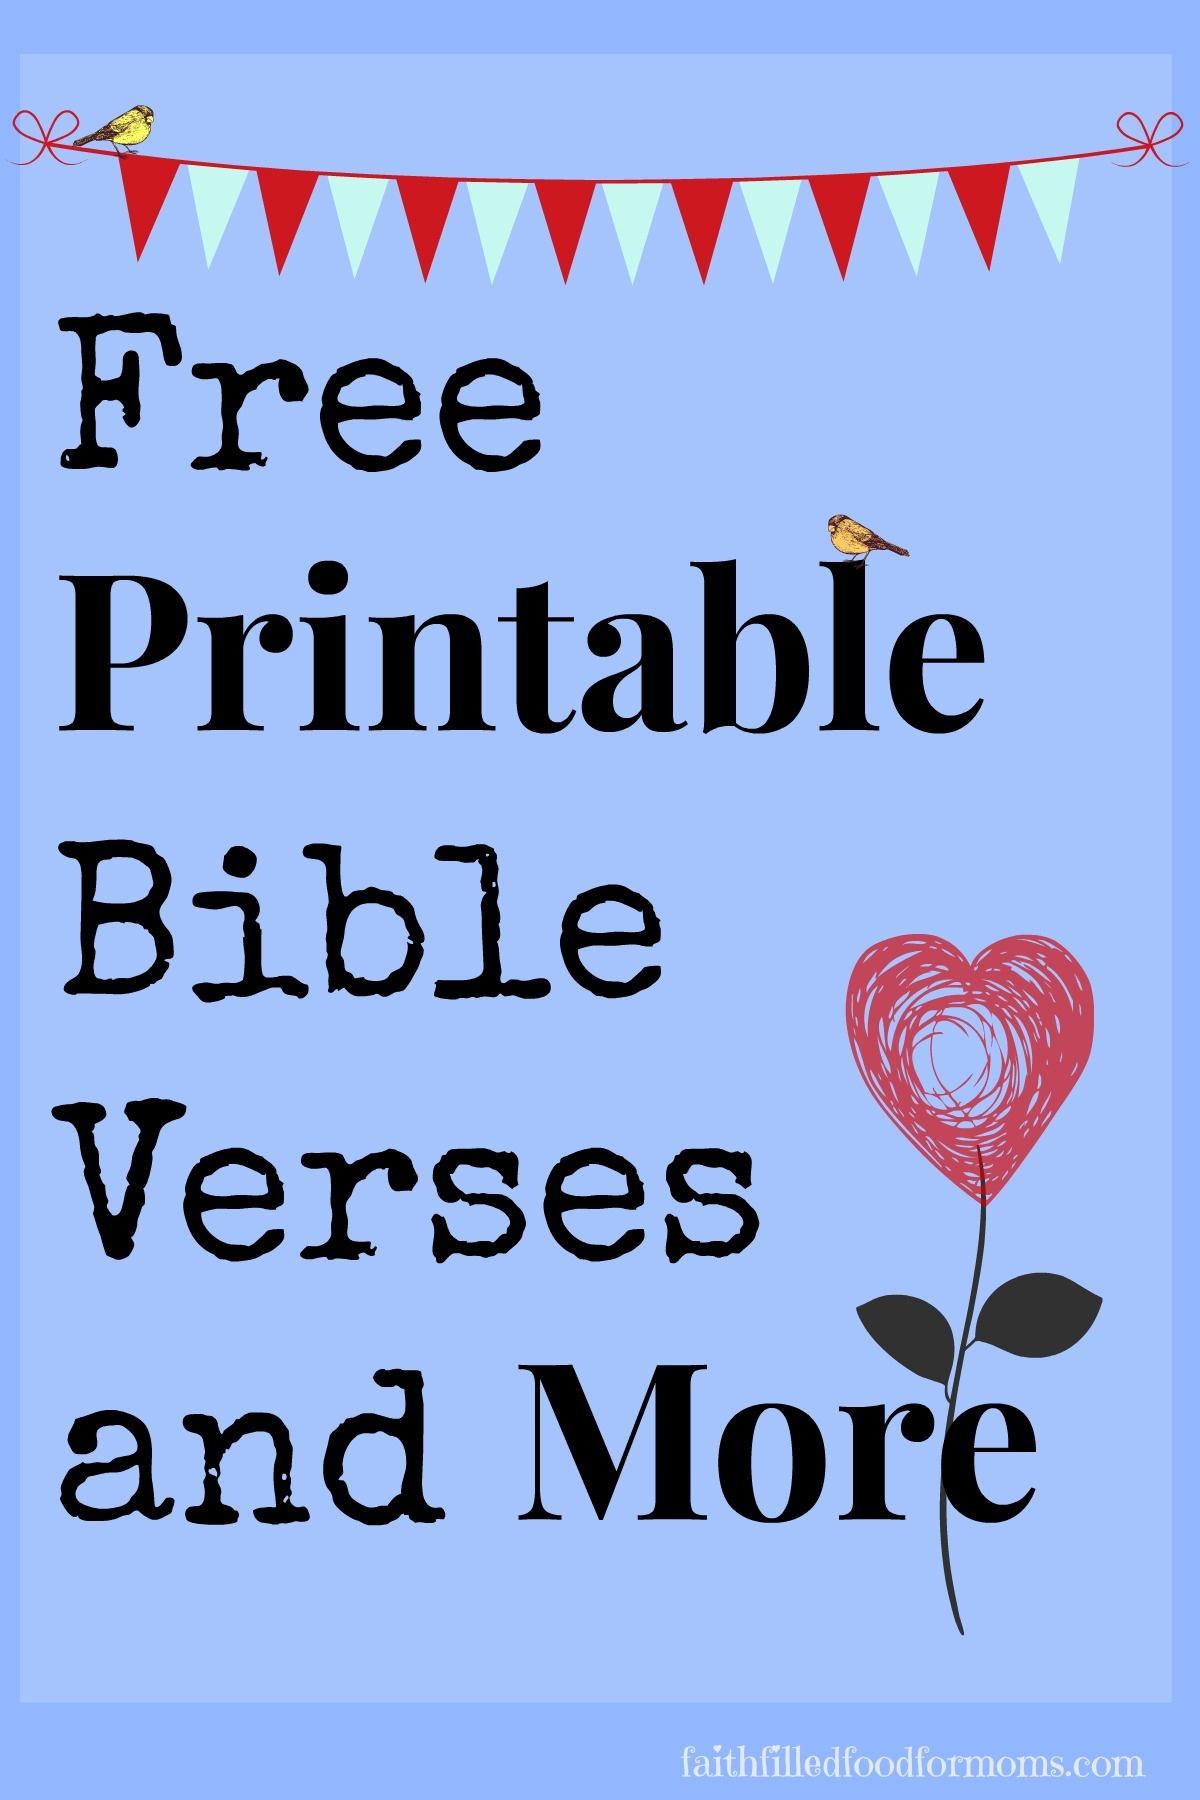 Printable Scripture Bible Verses • Faith Filled Food For Moms - Free Printable Scripture Verses